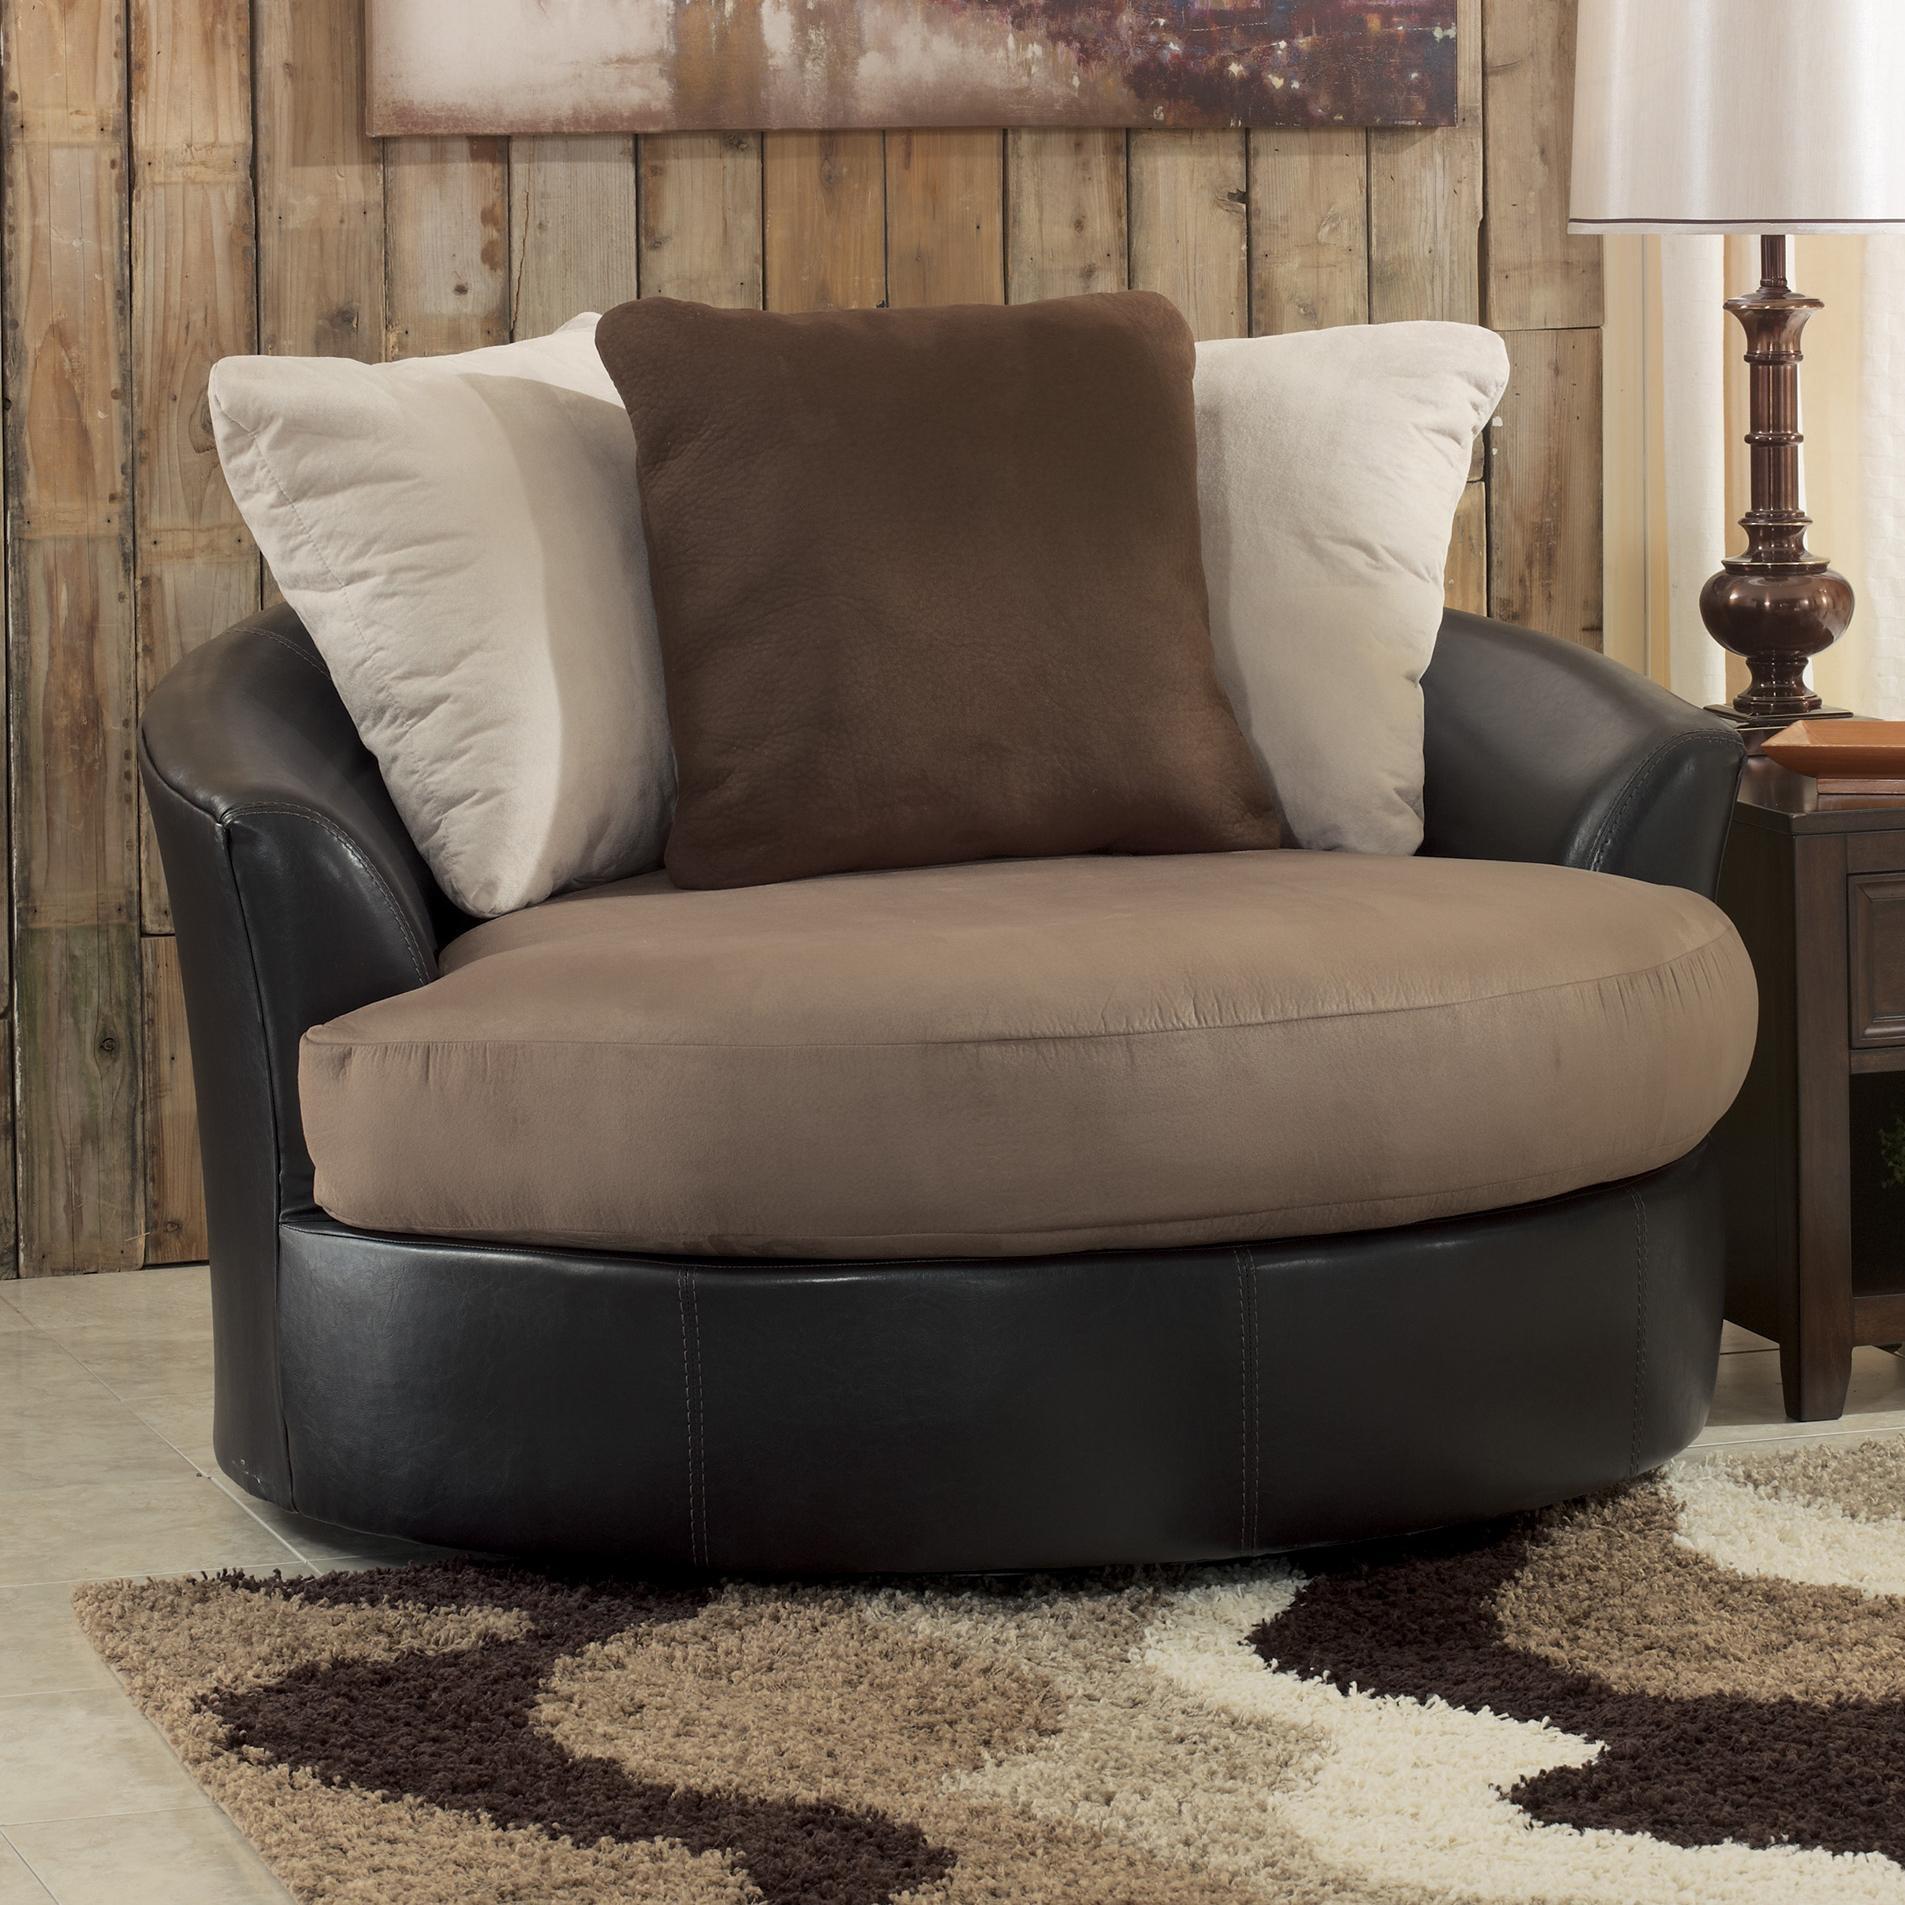 Big Chairs For Living Room | Simmons Trinidad Taupe Living Room Set ...